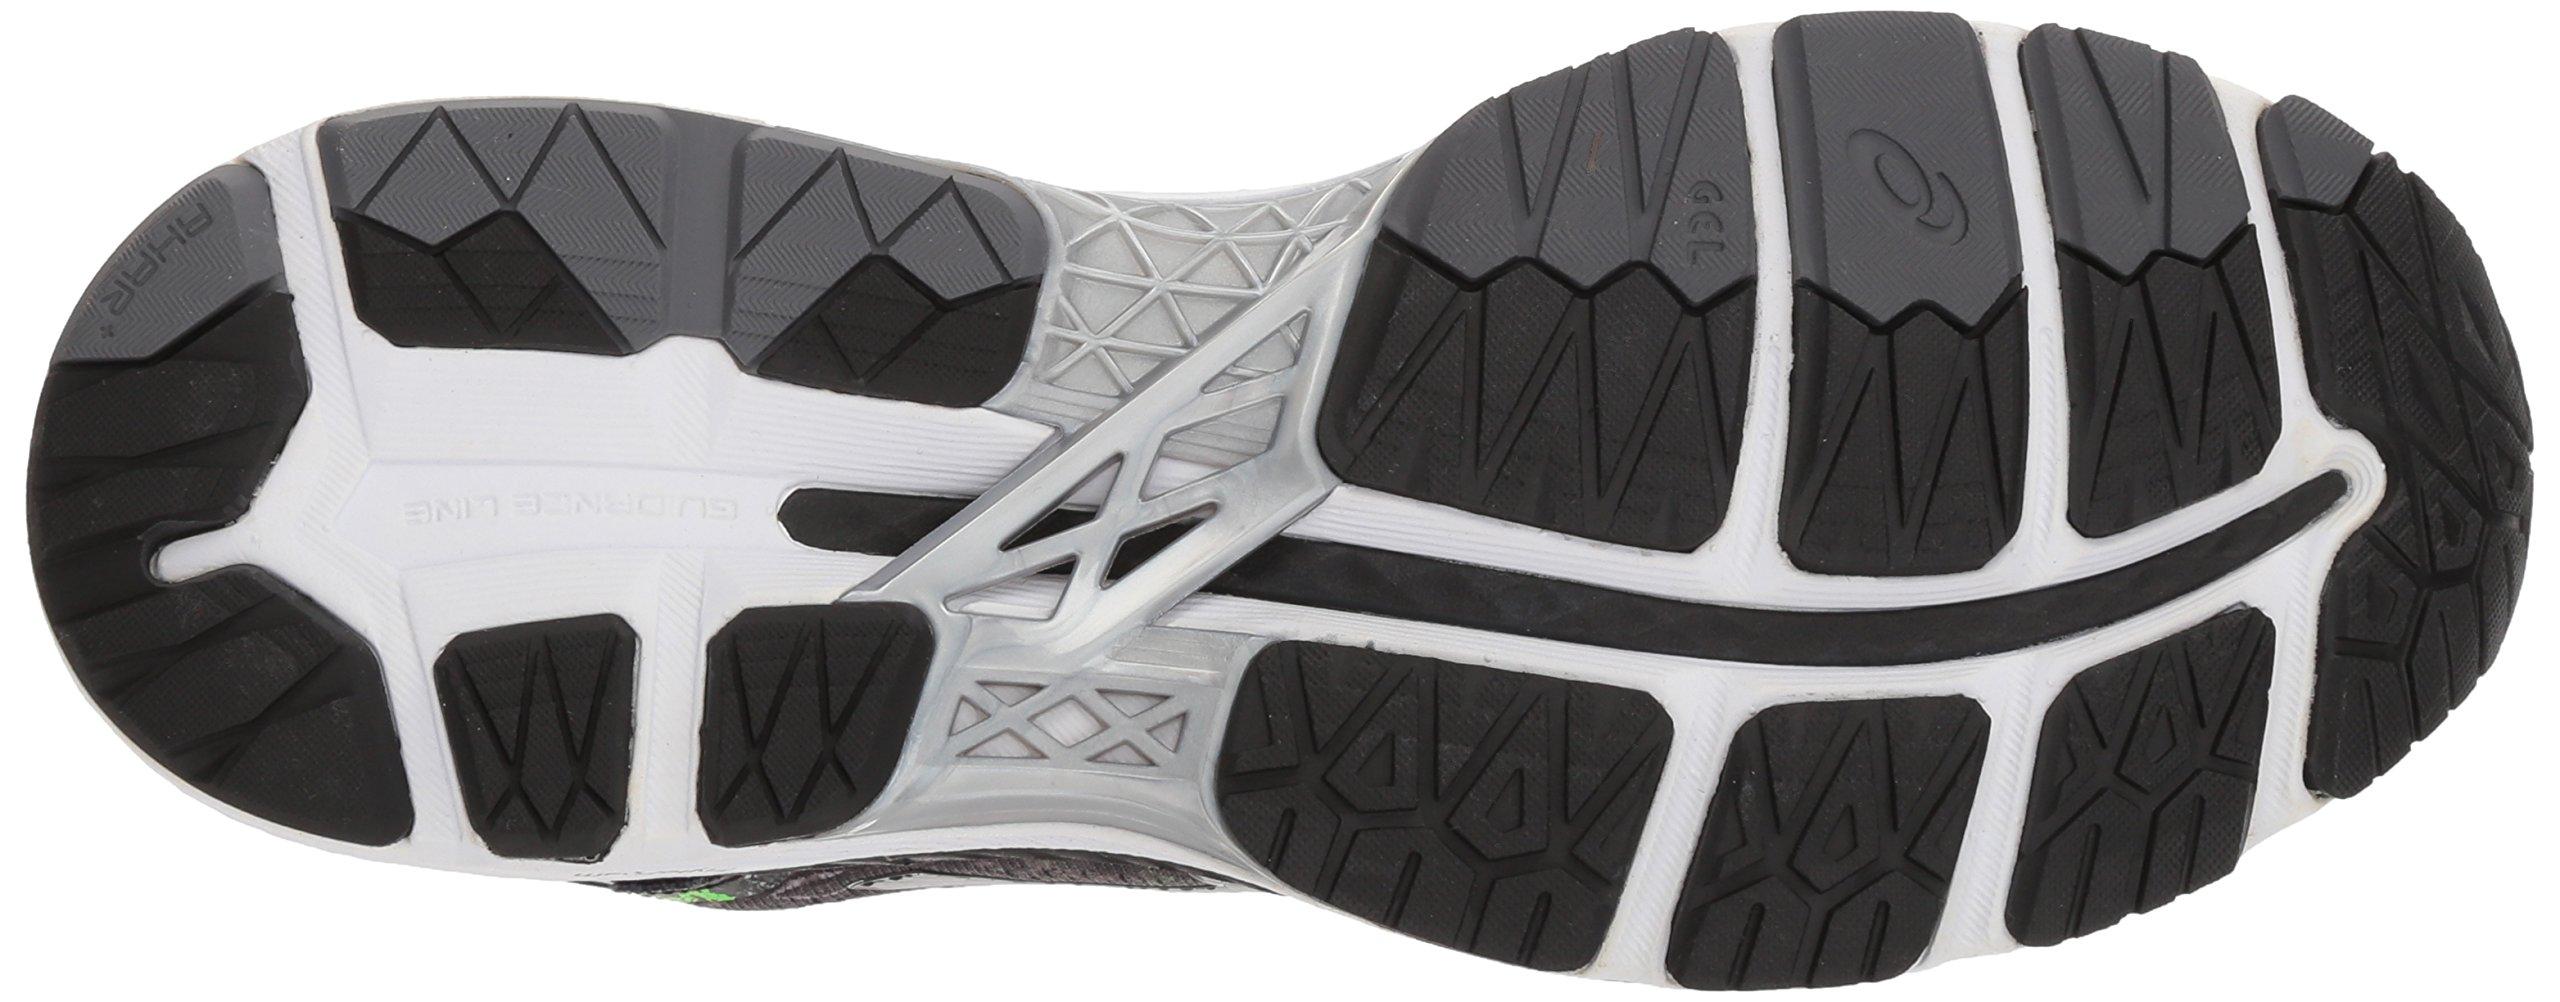 81GBJmPYsCL - ASICS Men's Gel-Kayano 23 Running Shoe